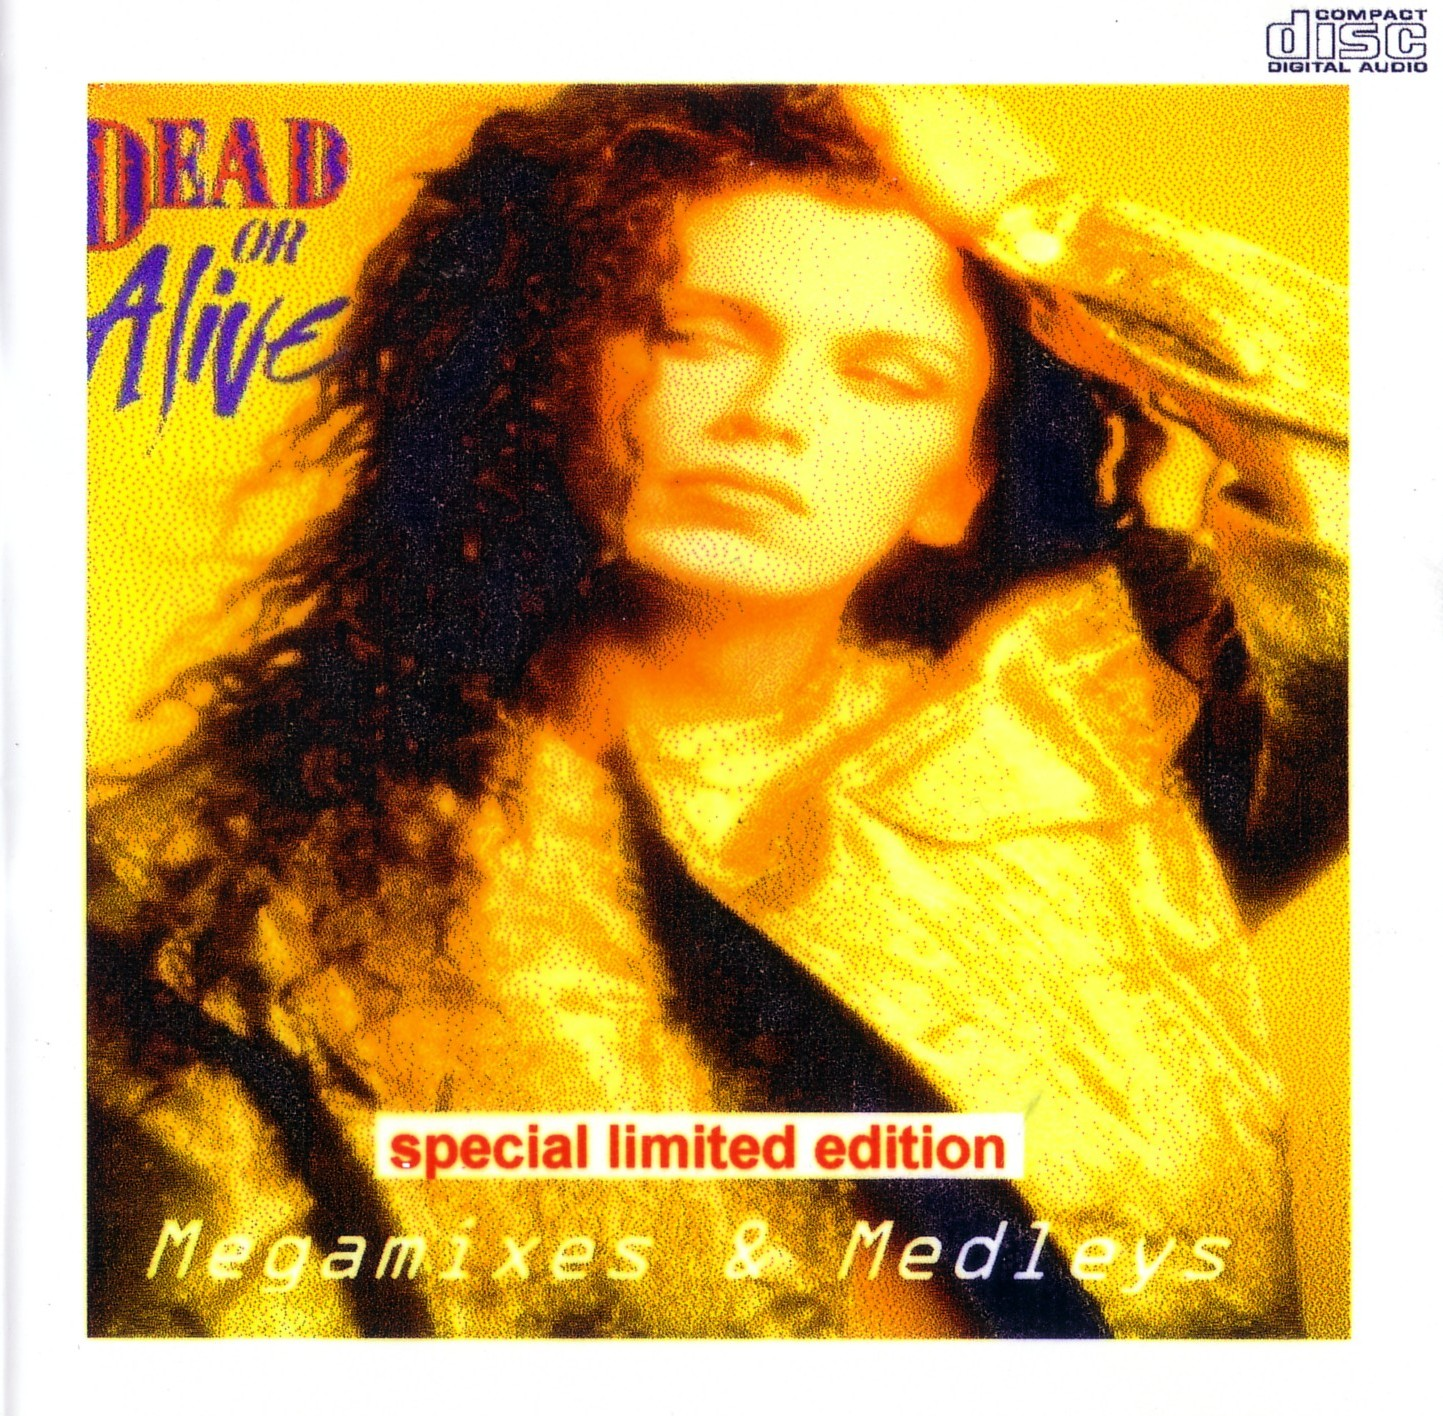 http://1.bp.blogspot.com/_rD5O5vyqk58/TE6w1F4QVVI/AAAAAAAABQ4/O3tIwXVaAIE/s1600/_01+DEAD+OR+ALIVE+-+Megamixes+%26+Medleys+(Album)+front+main+cover.jpg